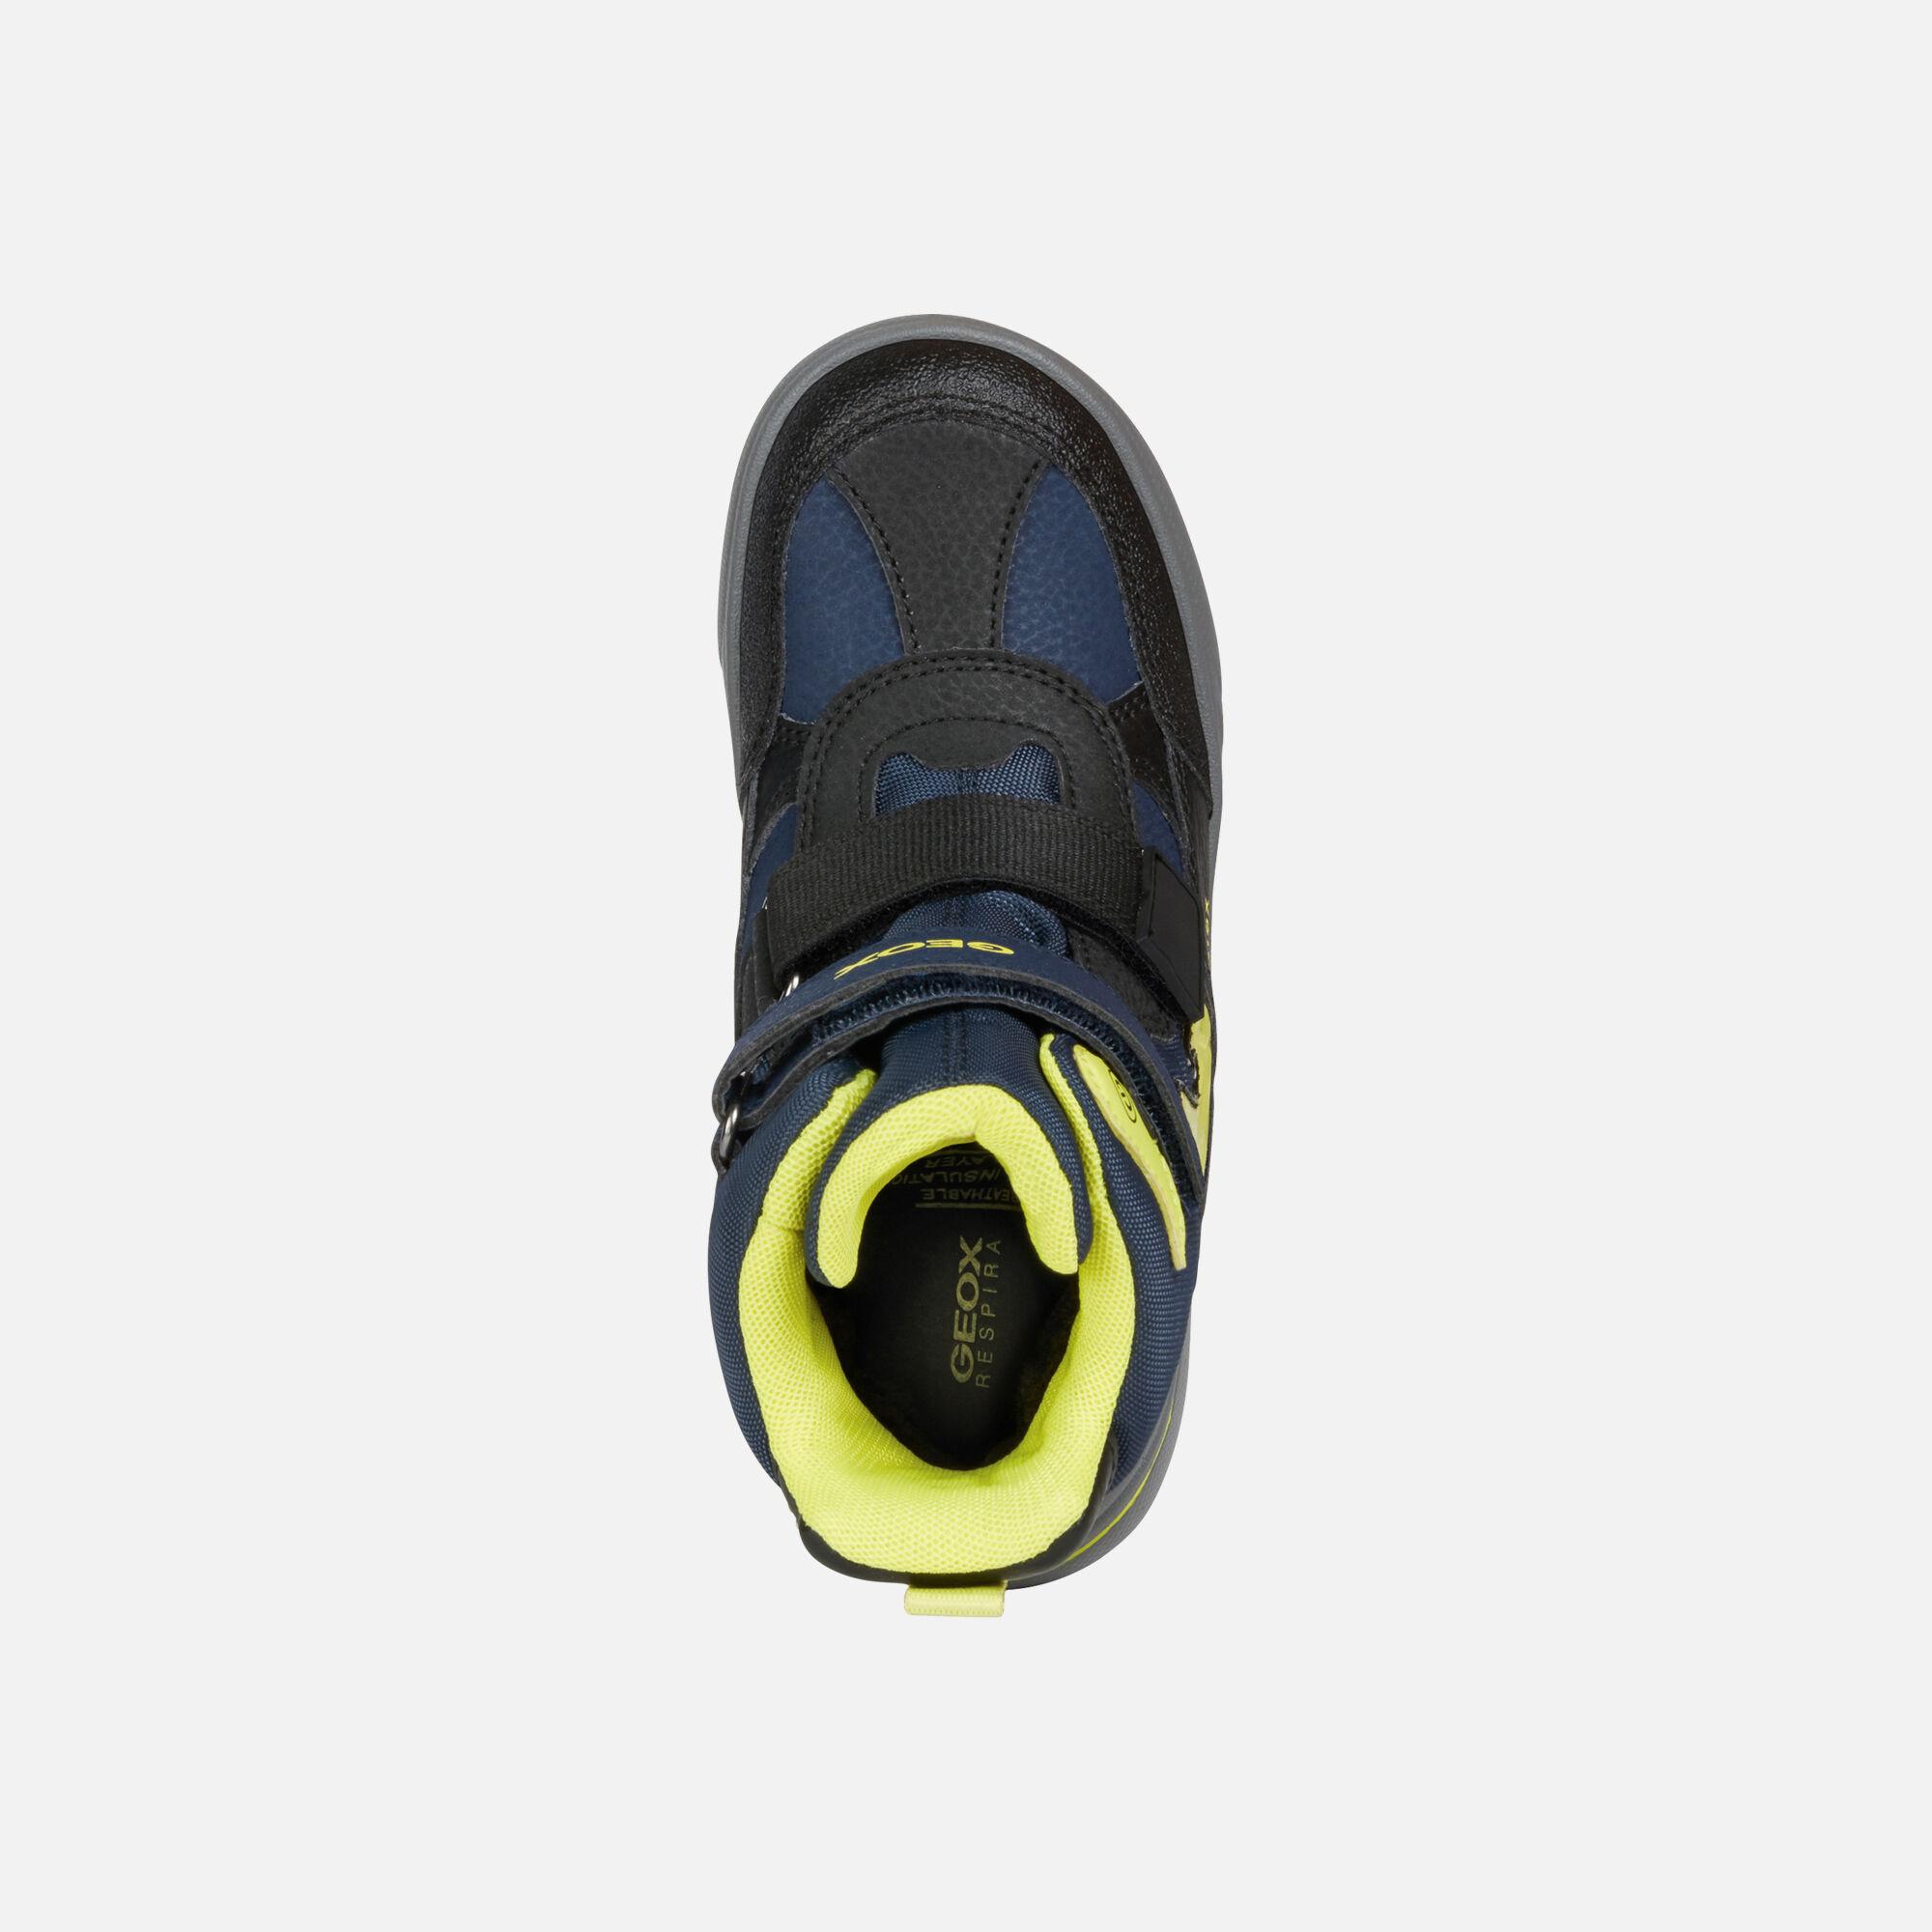 zapatos geox azul marino 50